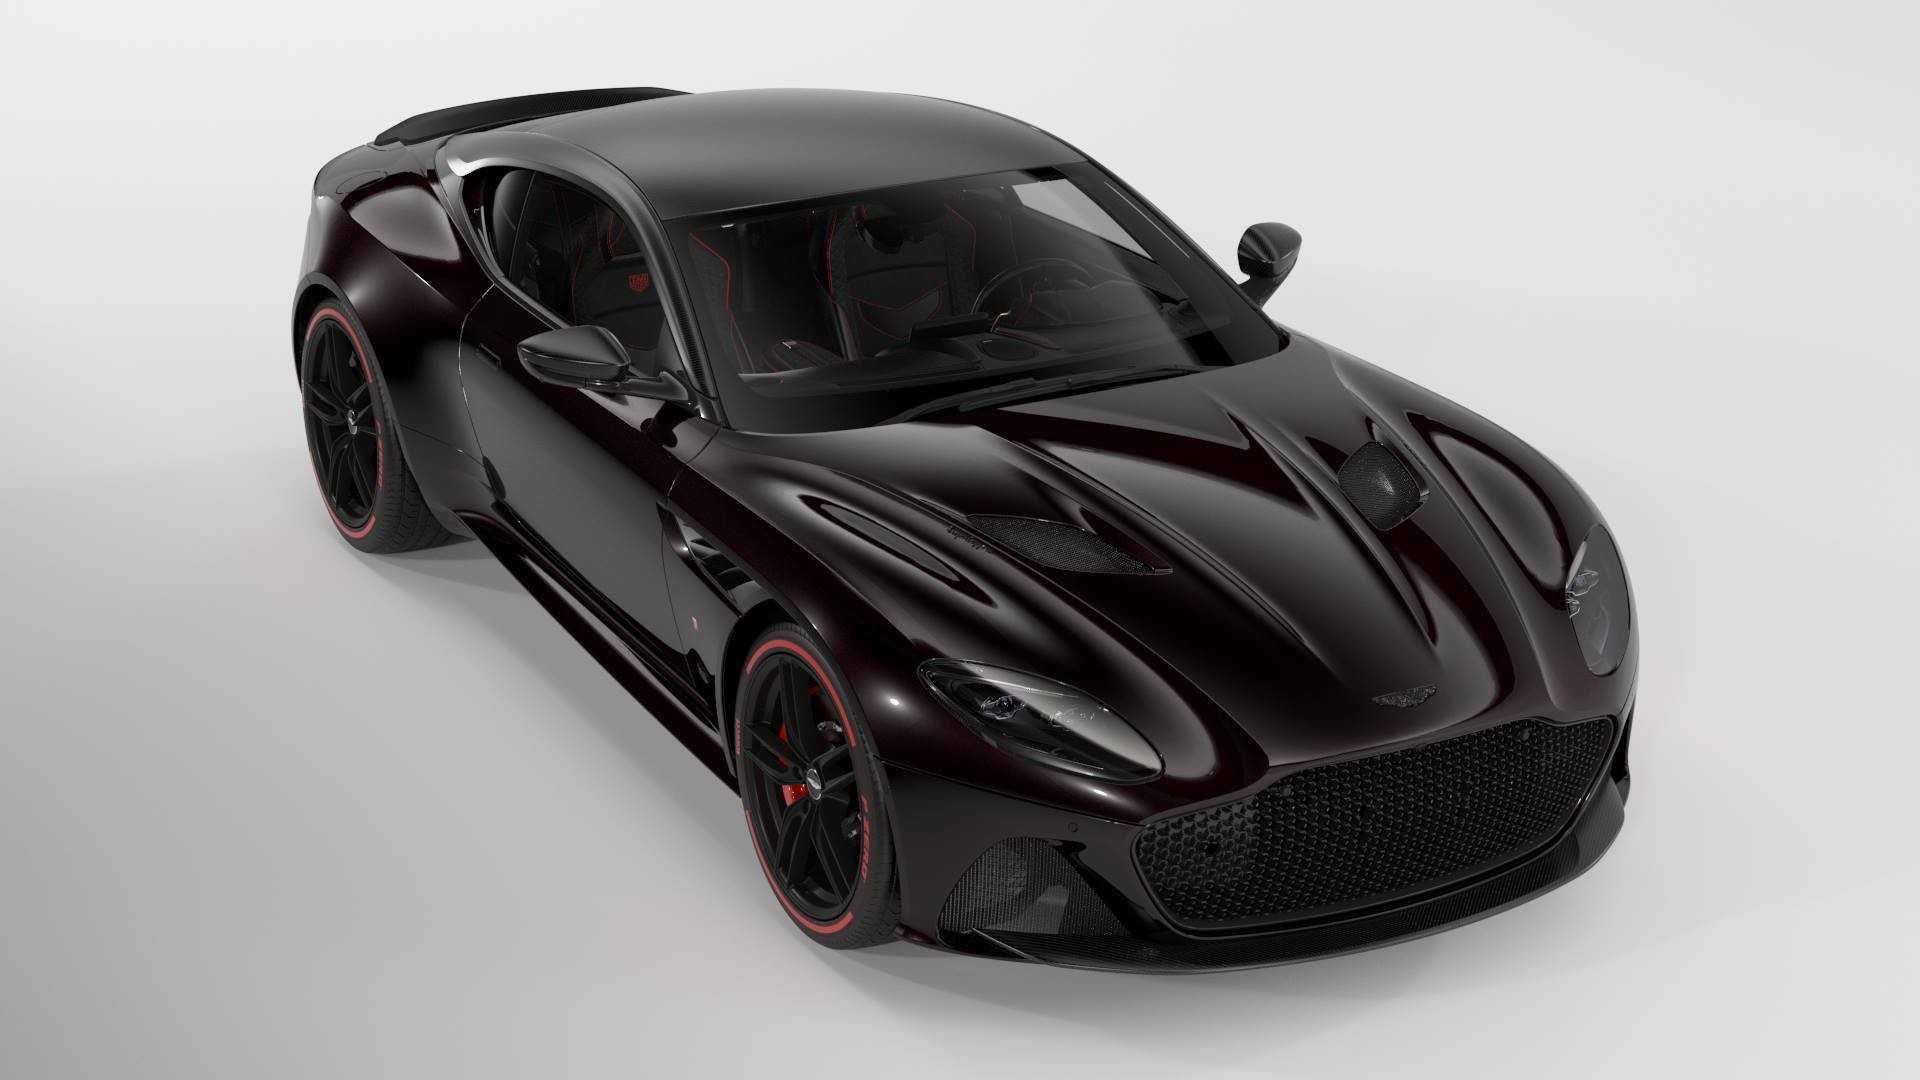 Aston Martin DBS Superlegera